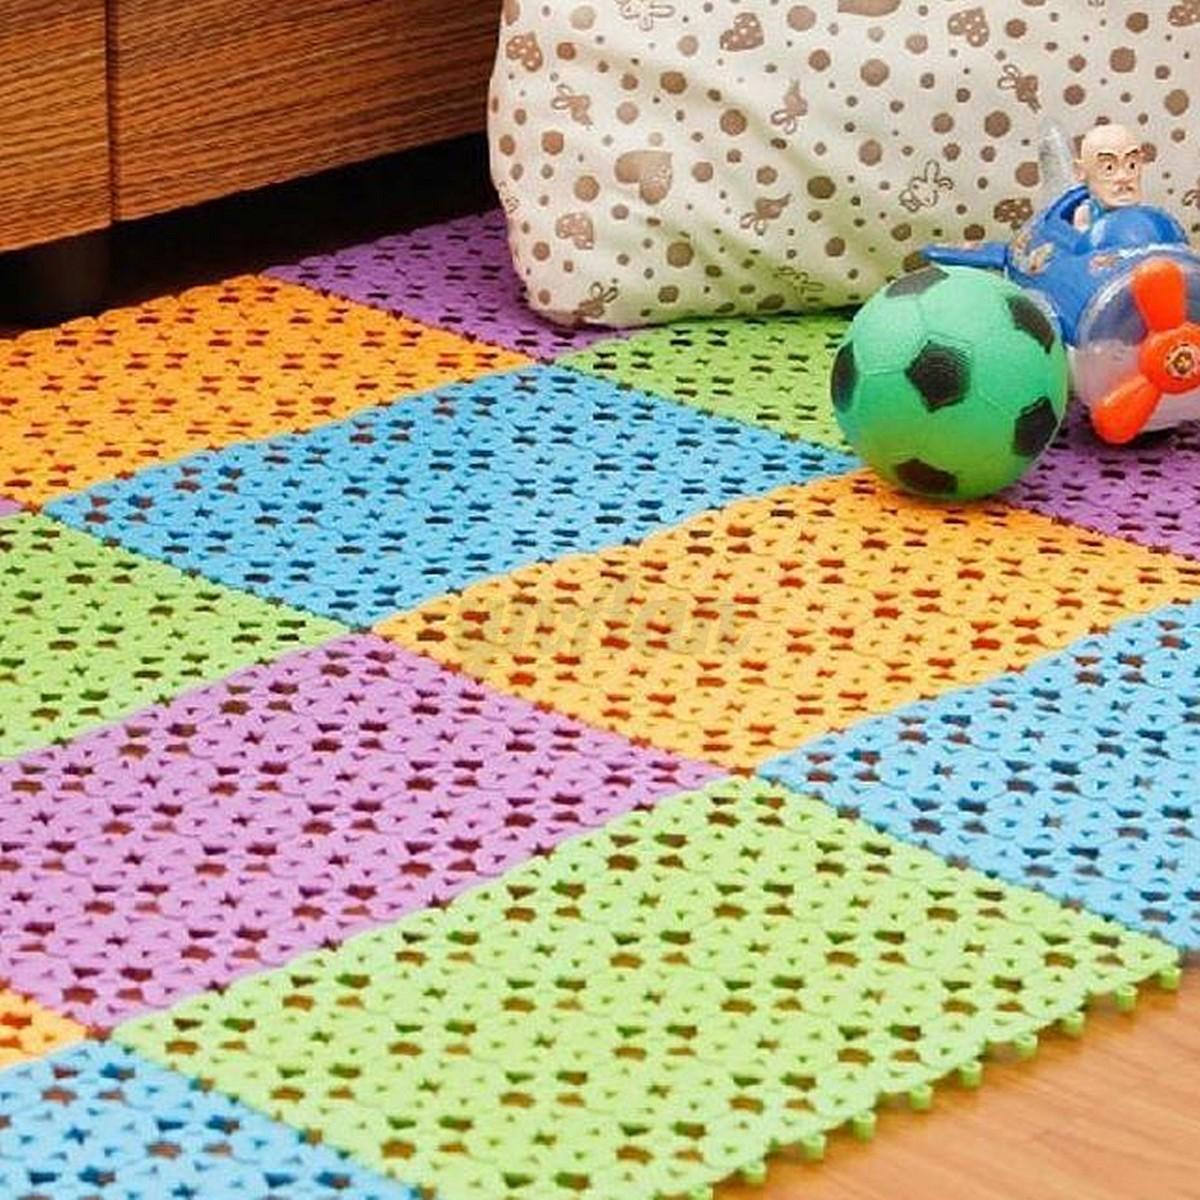 tapis antid rapant coussinet massage pieds sol salle de. Black Bedroom Furniture Sets. Home Design Ideas